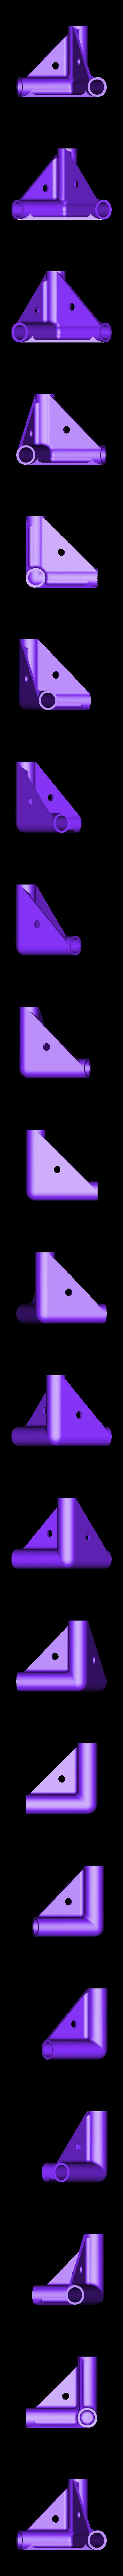 raccord angle 90  sup.stl Download free STL file Pipe brackets dia 12 • 3D printing model, mk25